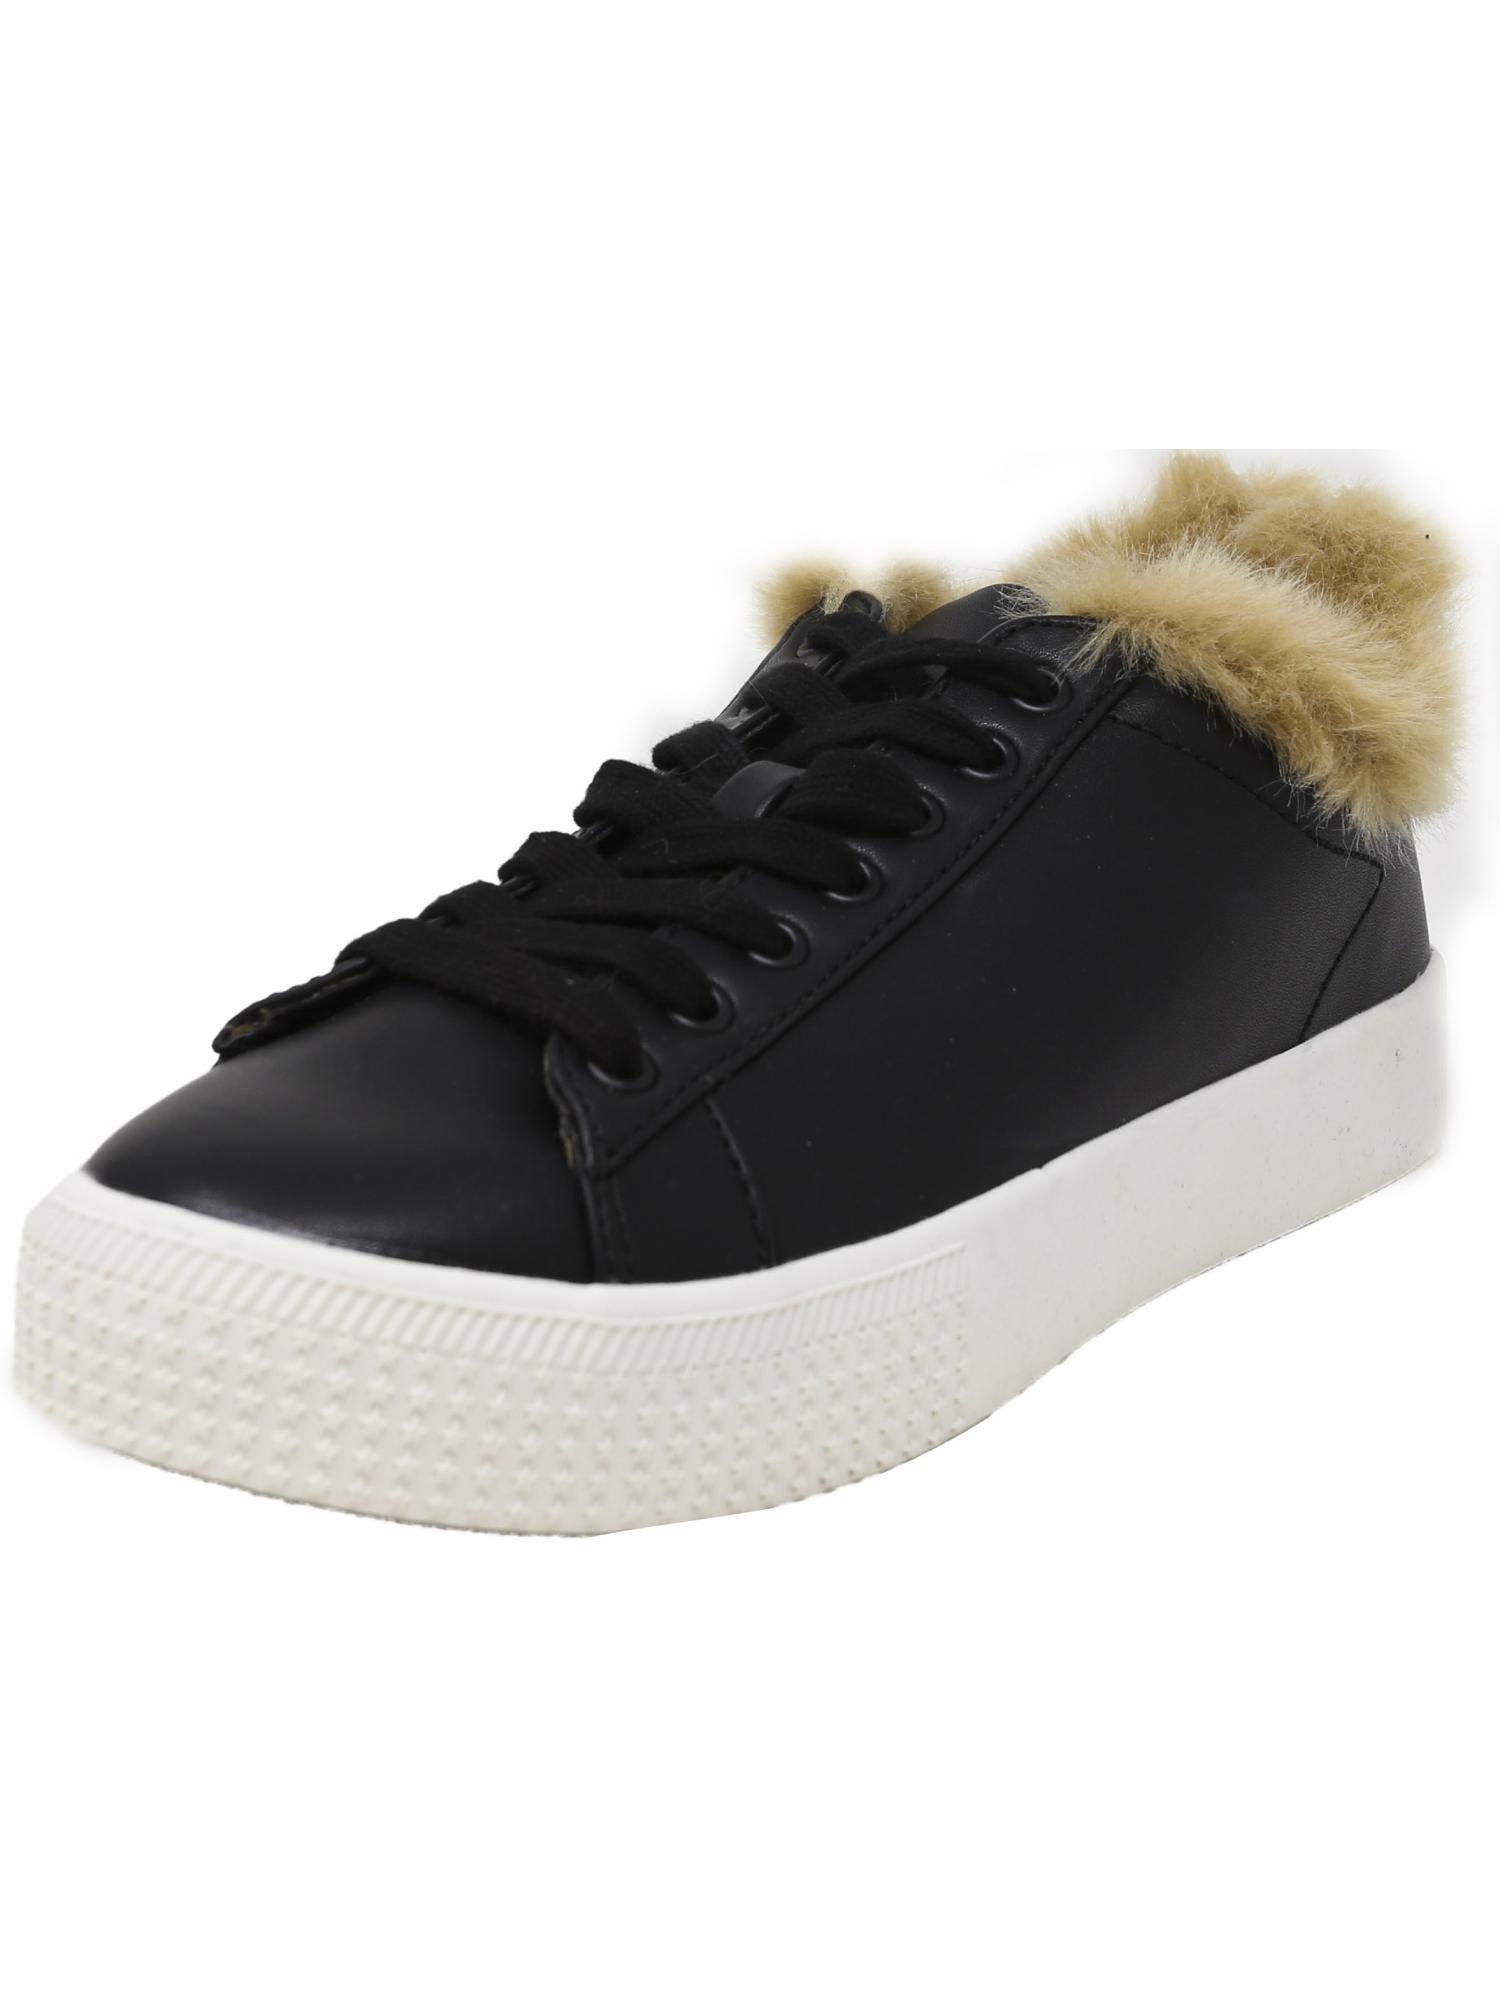 Steve-Madden-Women-039-s-Jordy-Ankle-High-Fashion-Sneaker